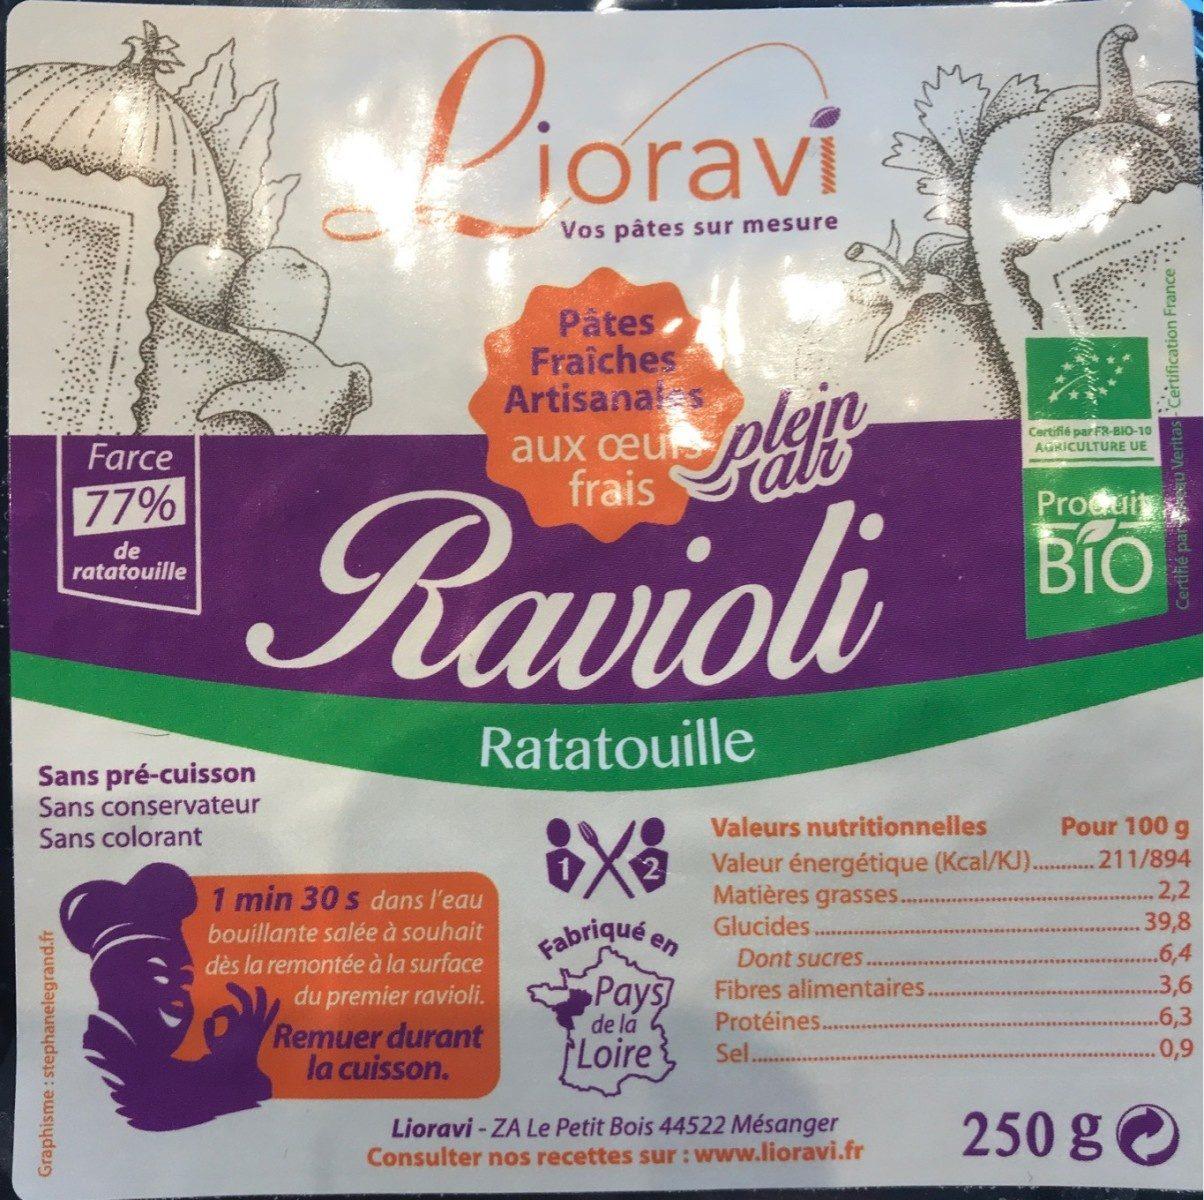 Ravioli Ratatouille - Product